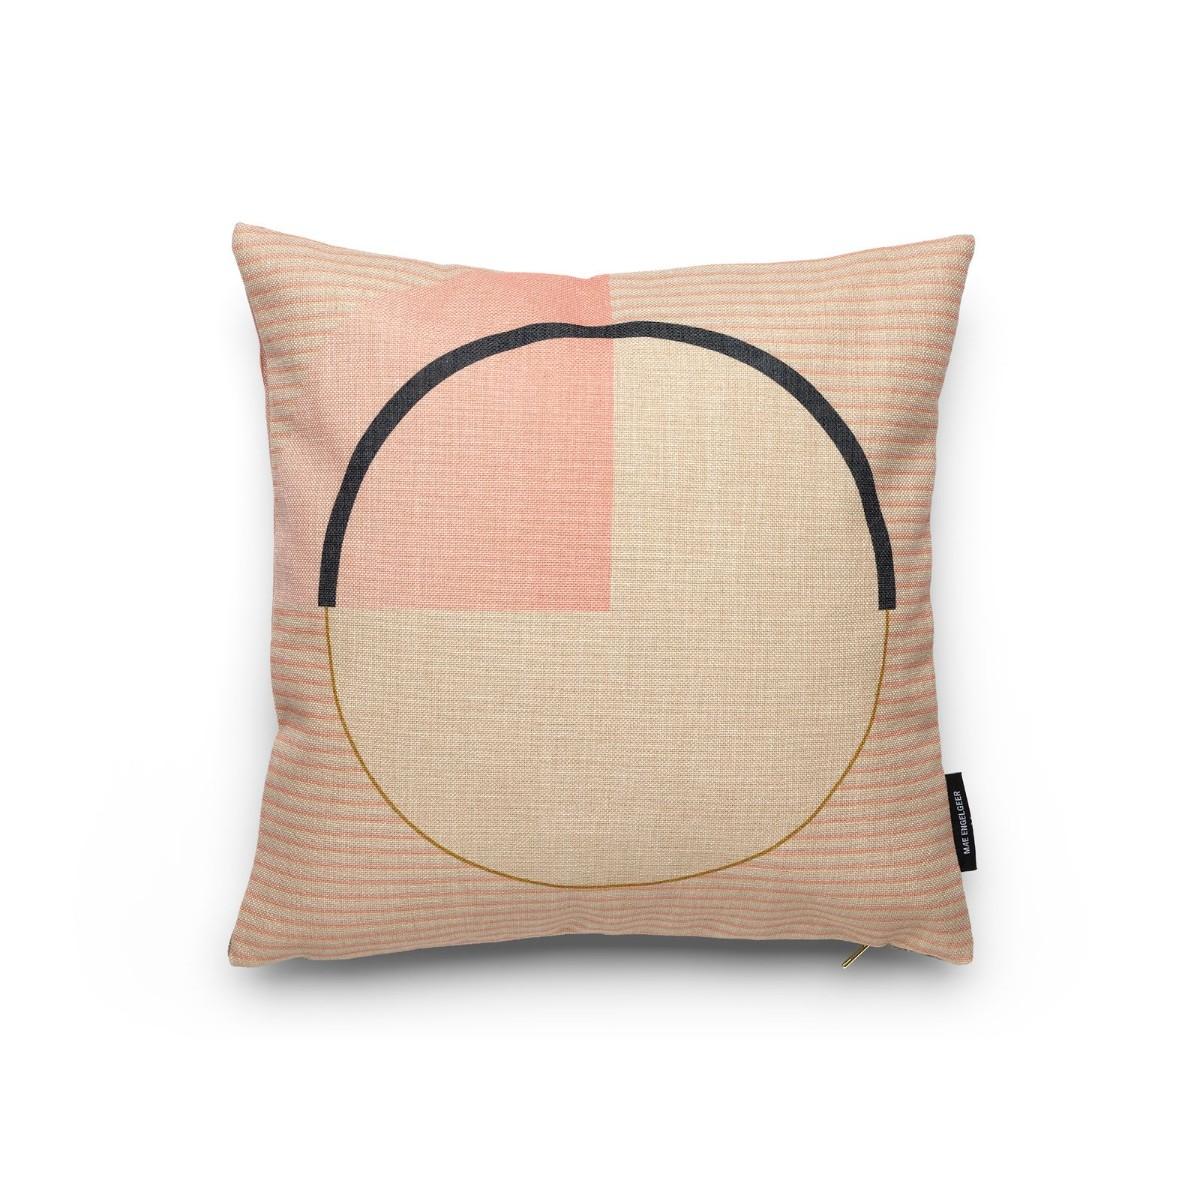 Fest I Circle Cushion (M. ENGELGEER) 45x45cm